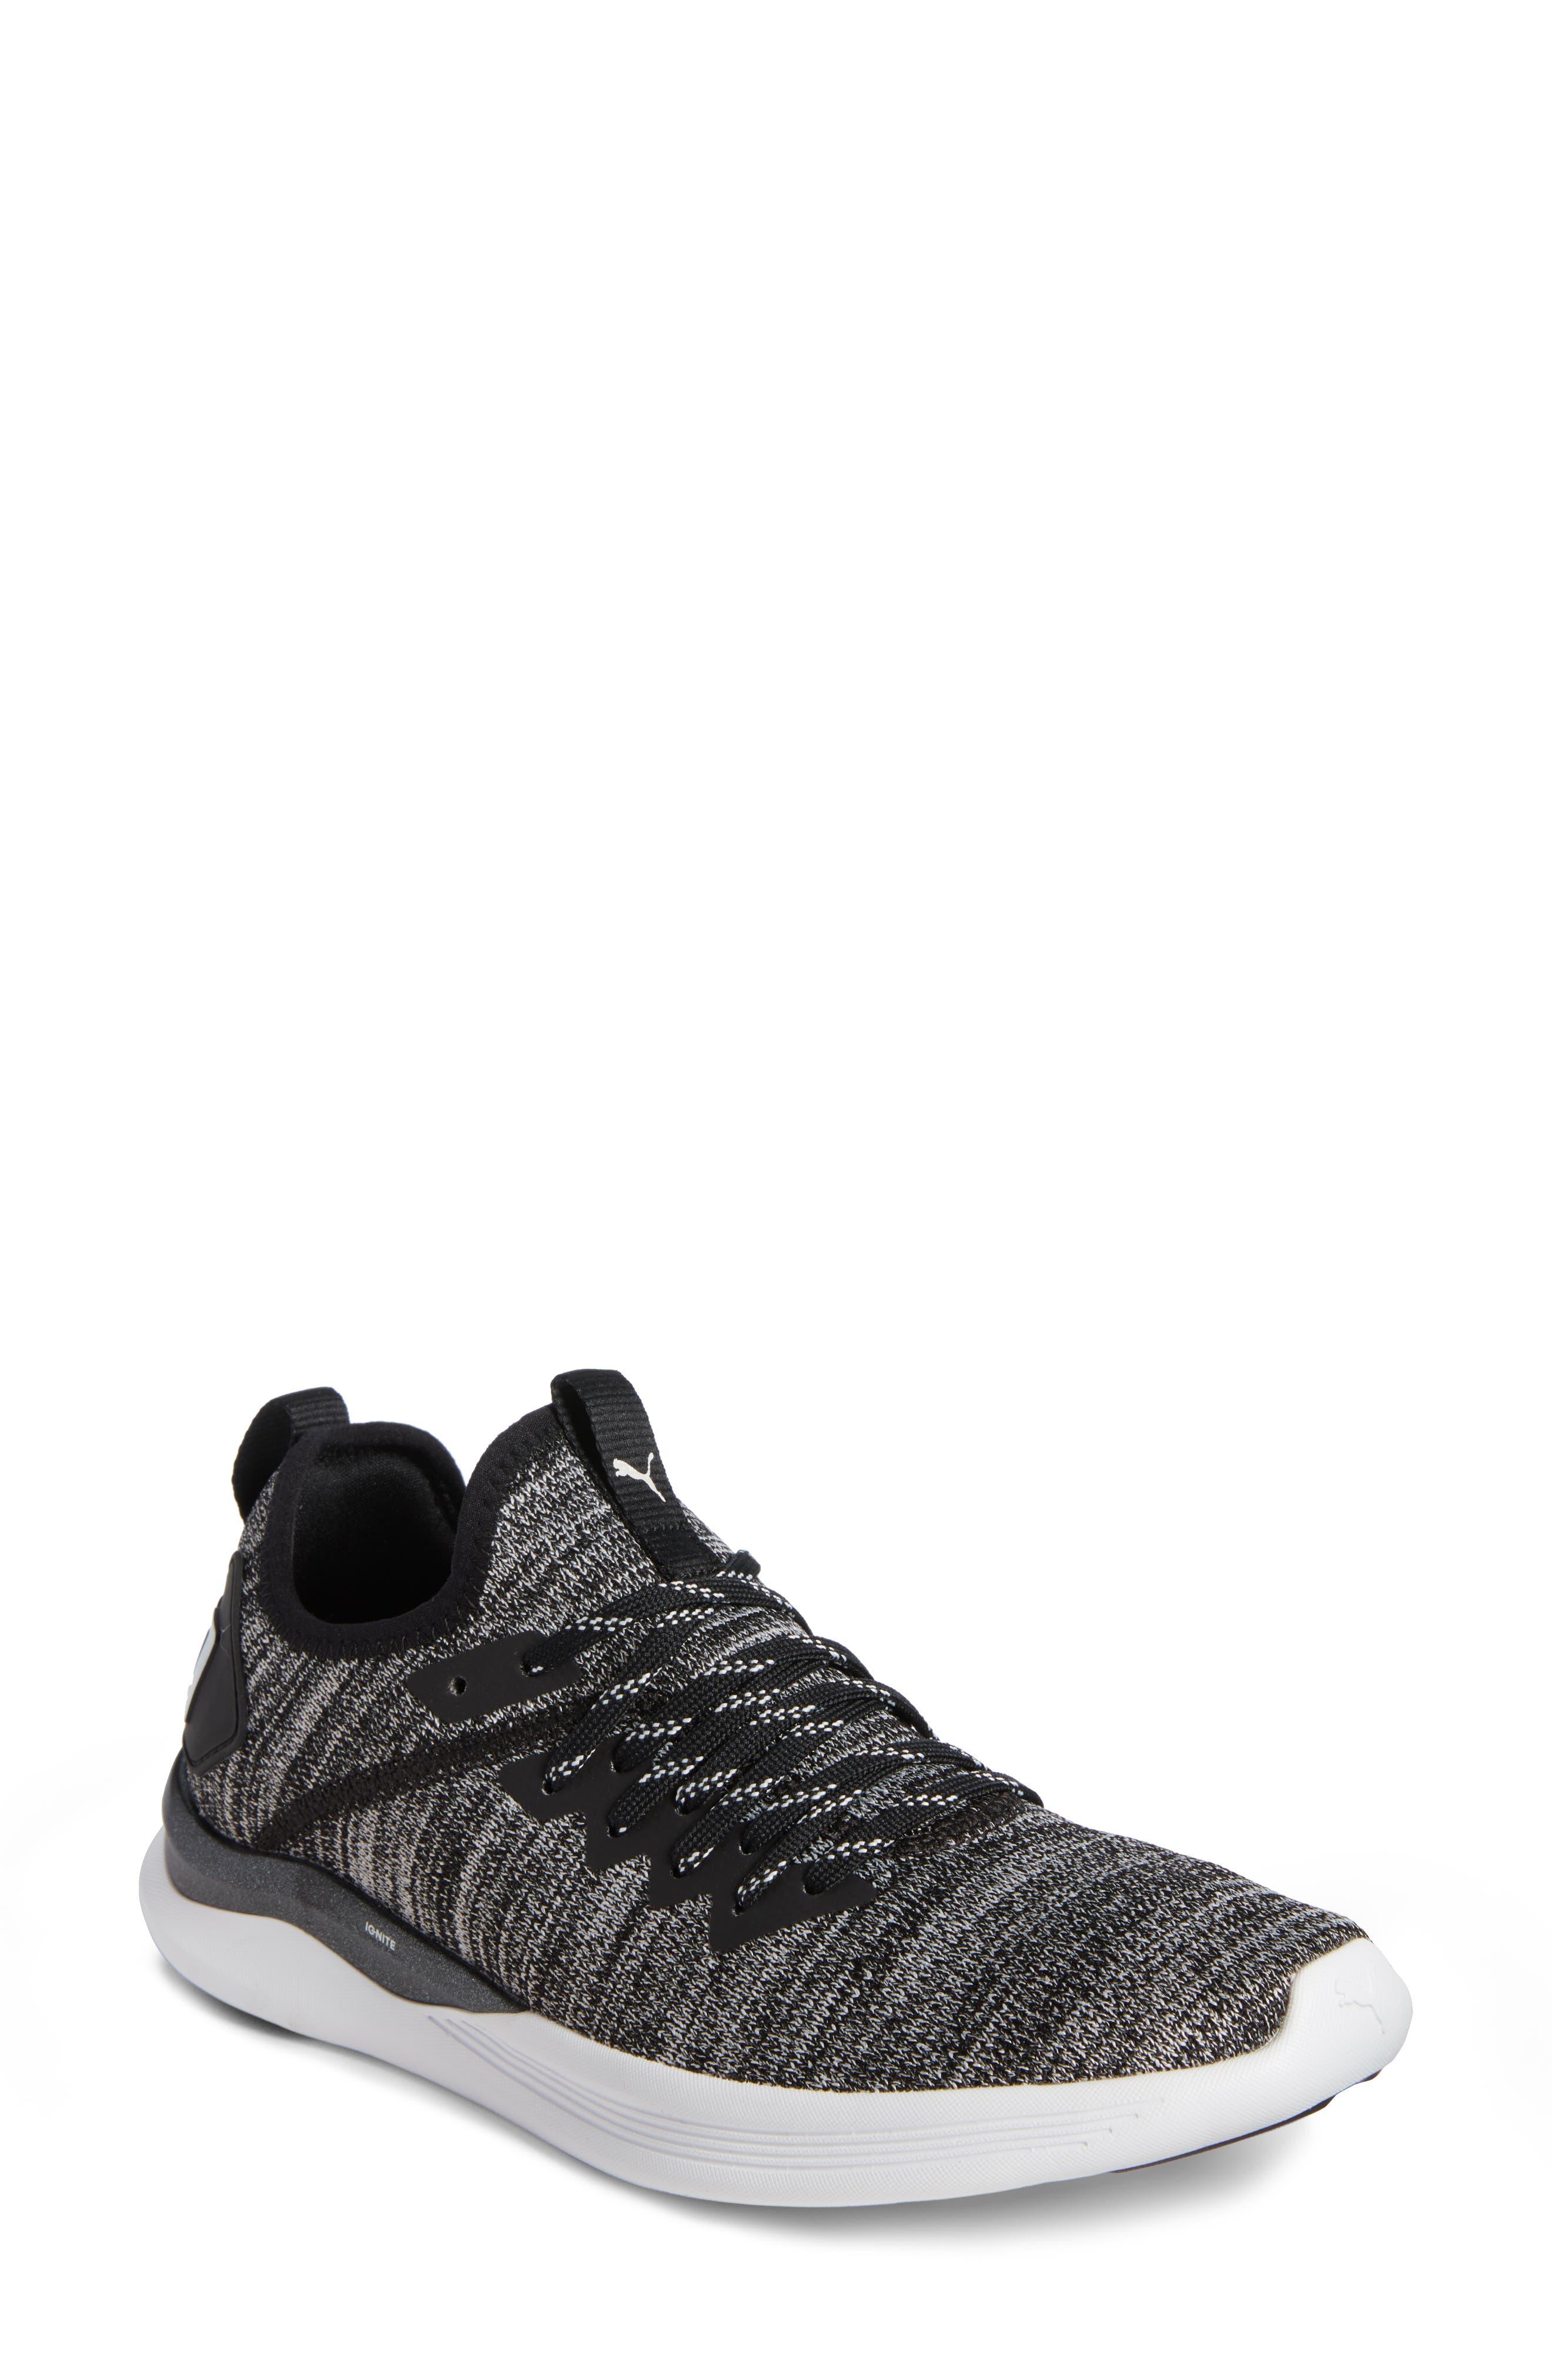 PUMA IGNITE Flash evoKNIT Training Shoe, Main, color, 001